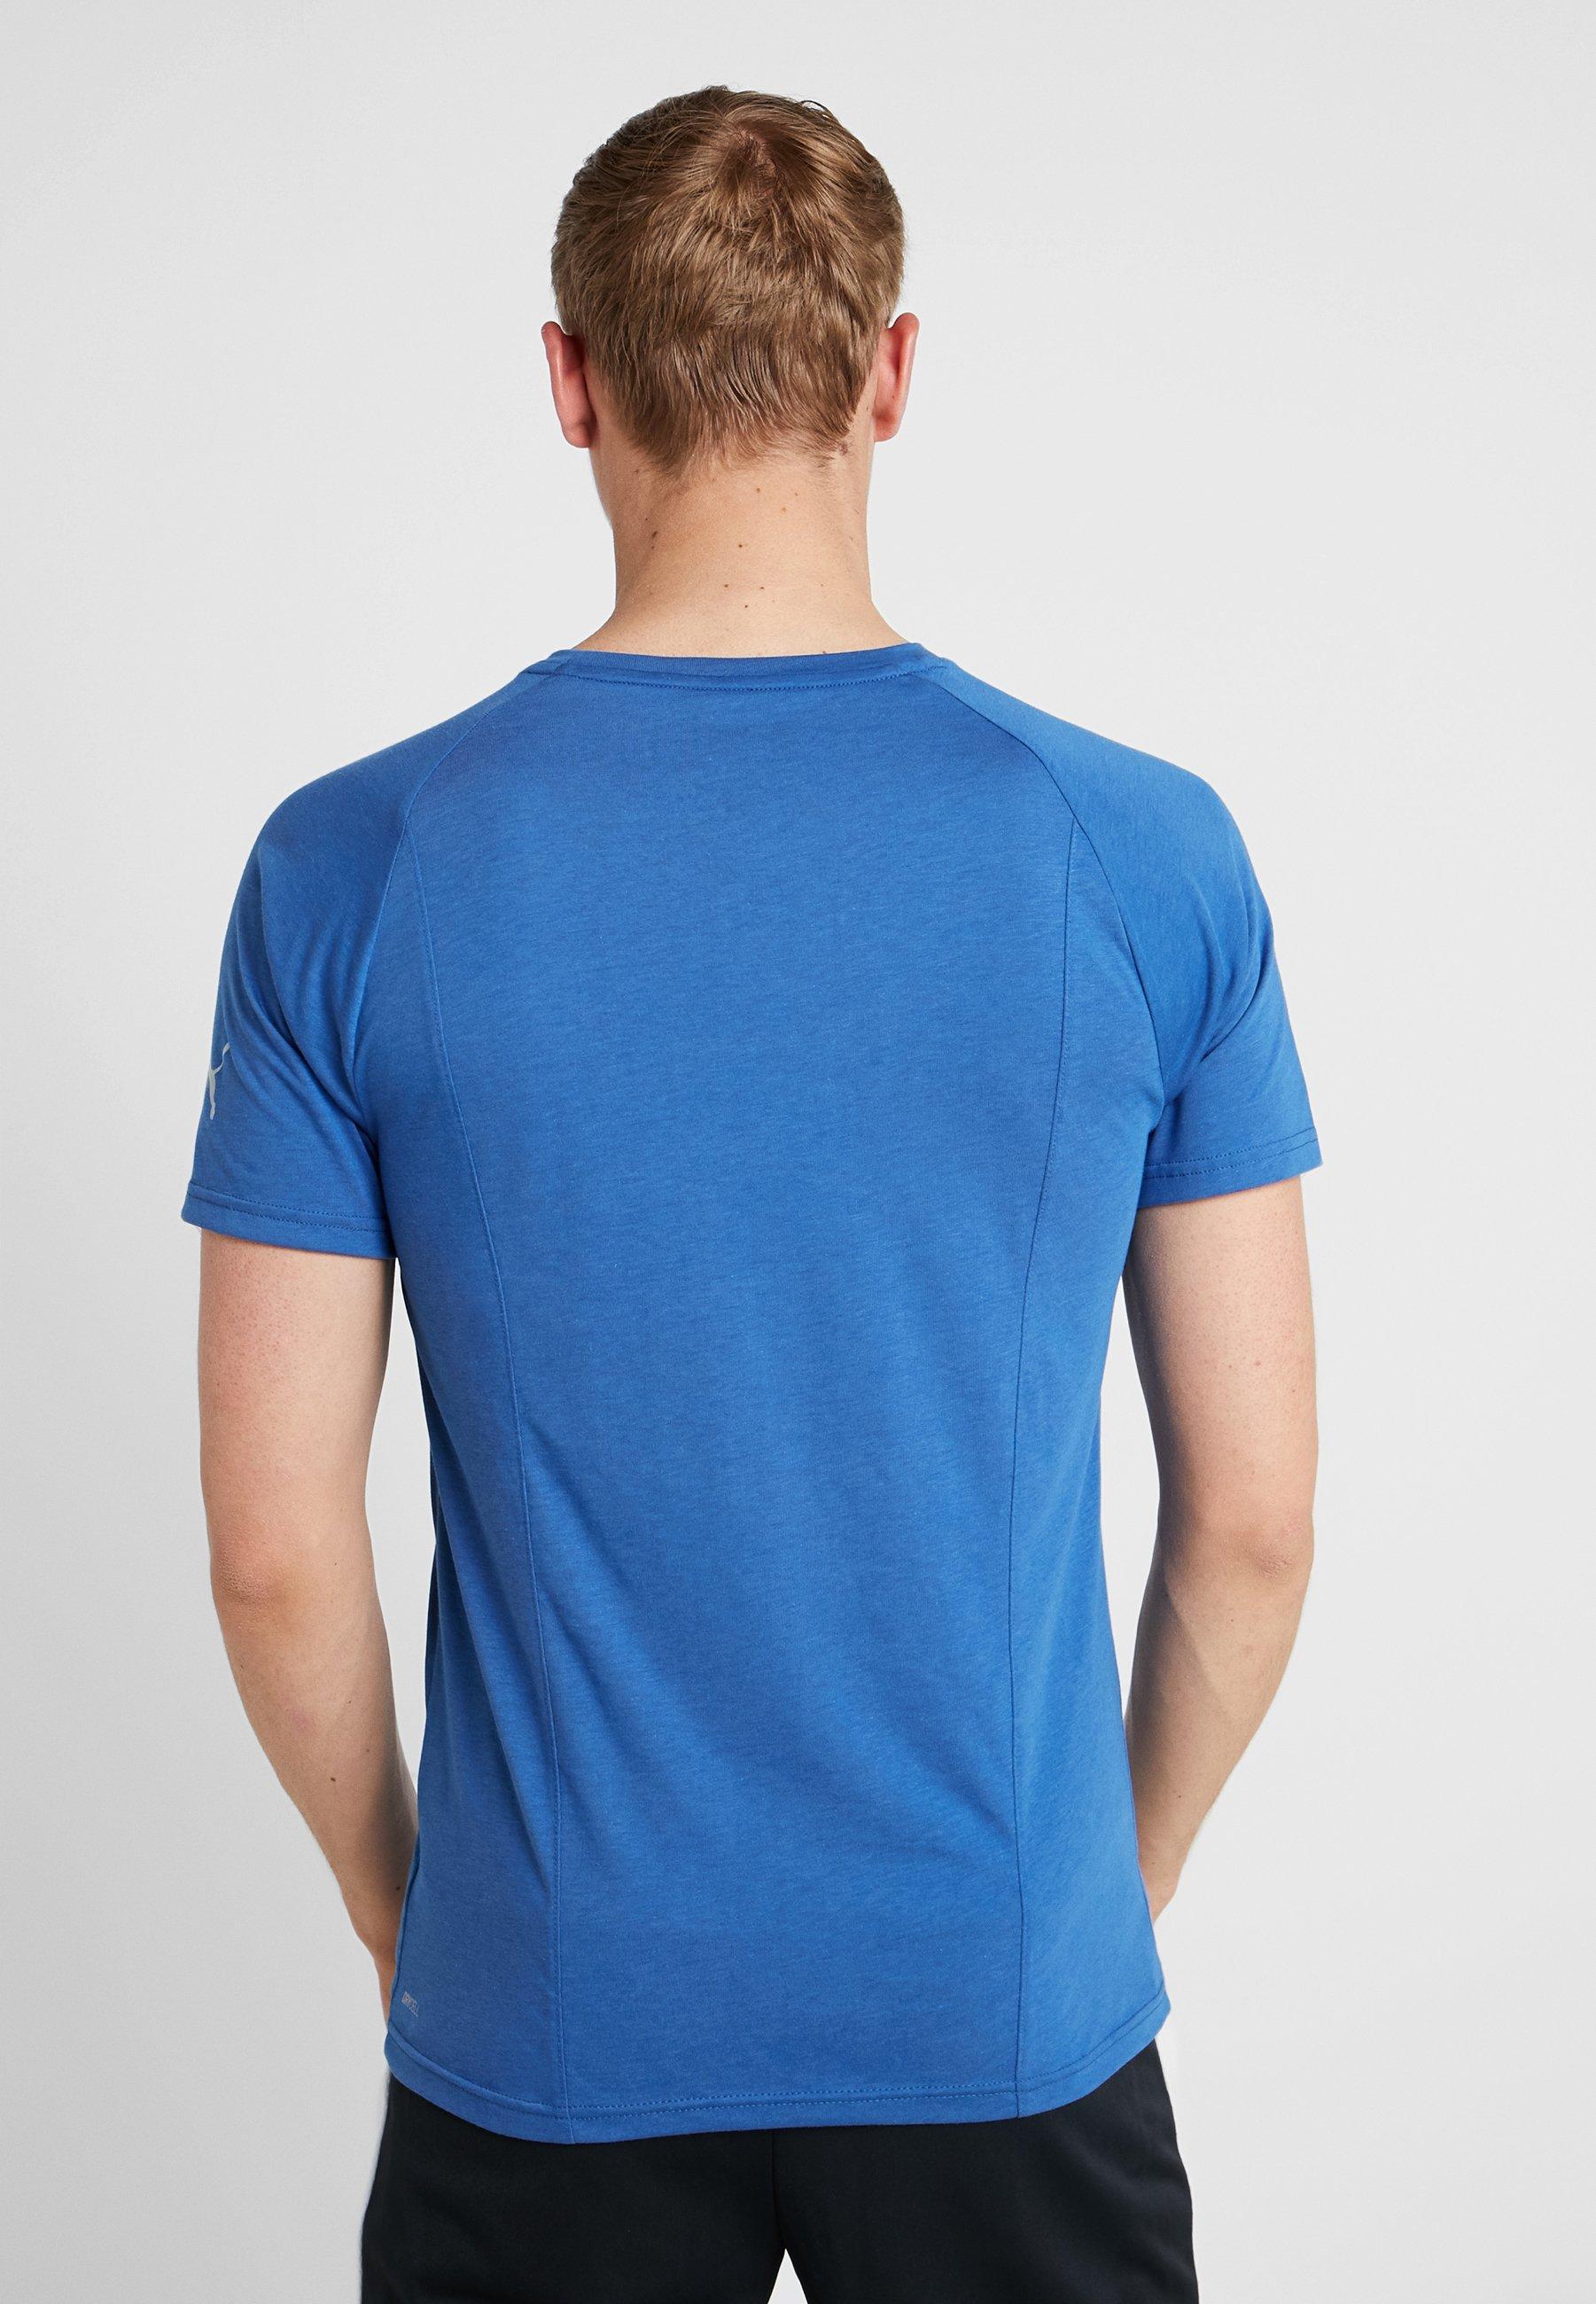 Blue Galaxy Reactive Color TeeT shirt Block Puma Imprimé kPZuXiwTO